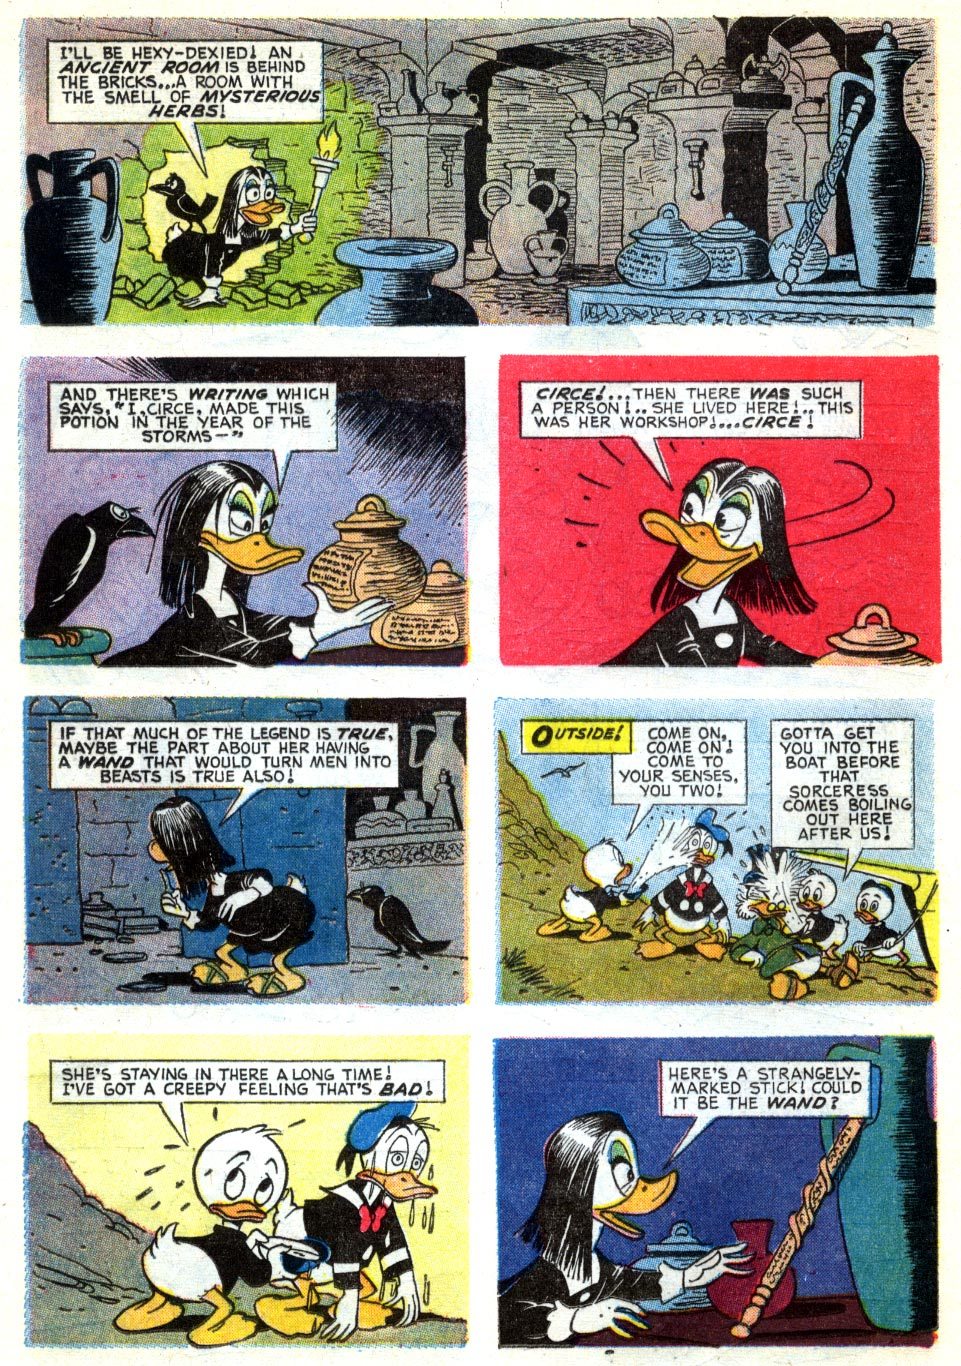 (1953) Issue #329 </opti #365 - English 12